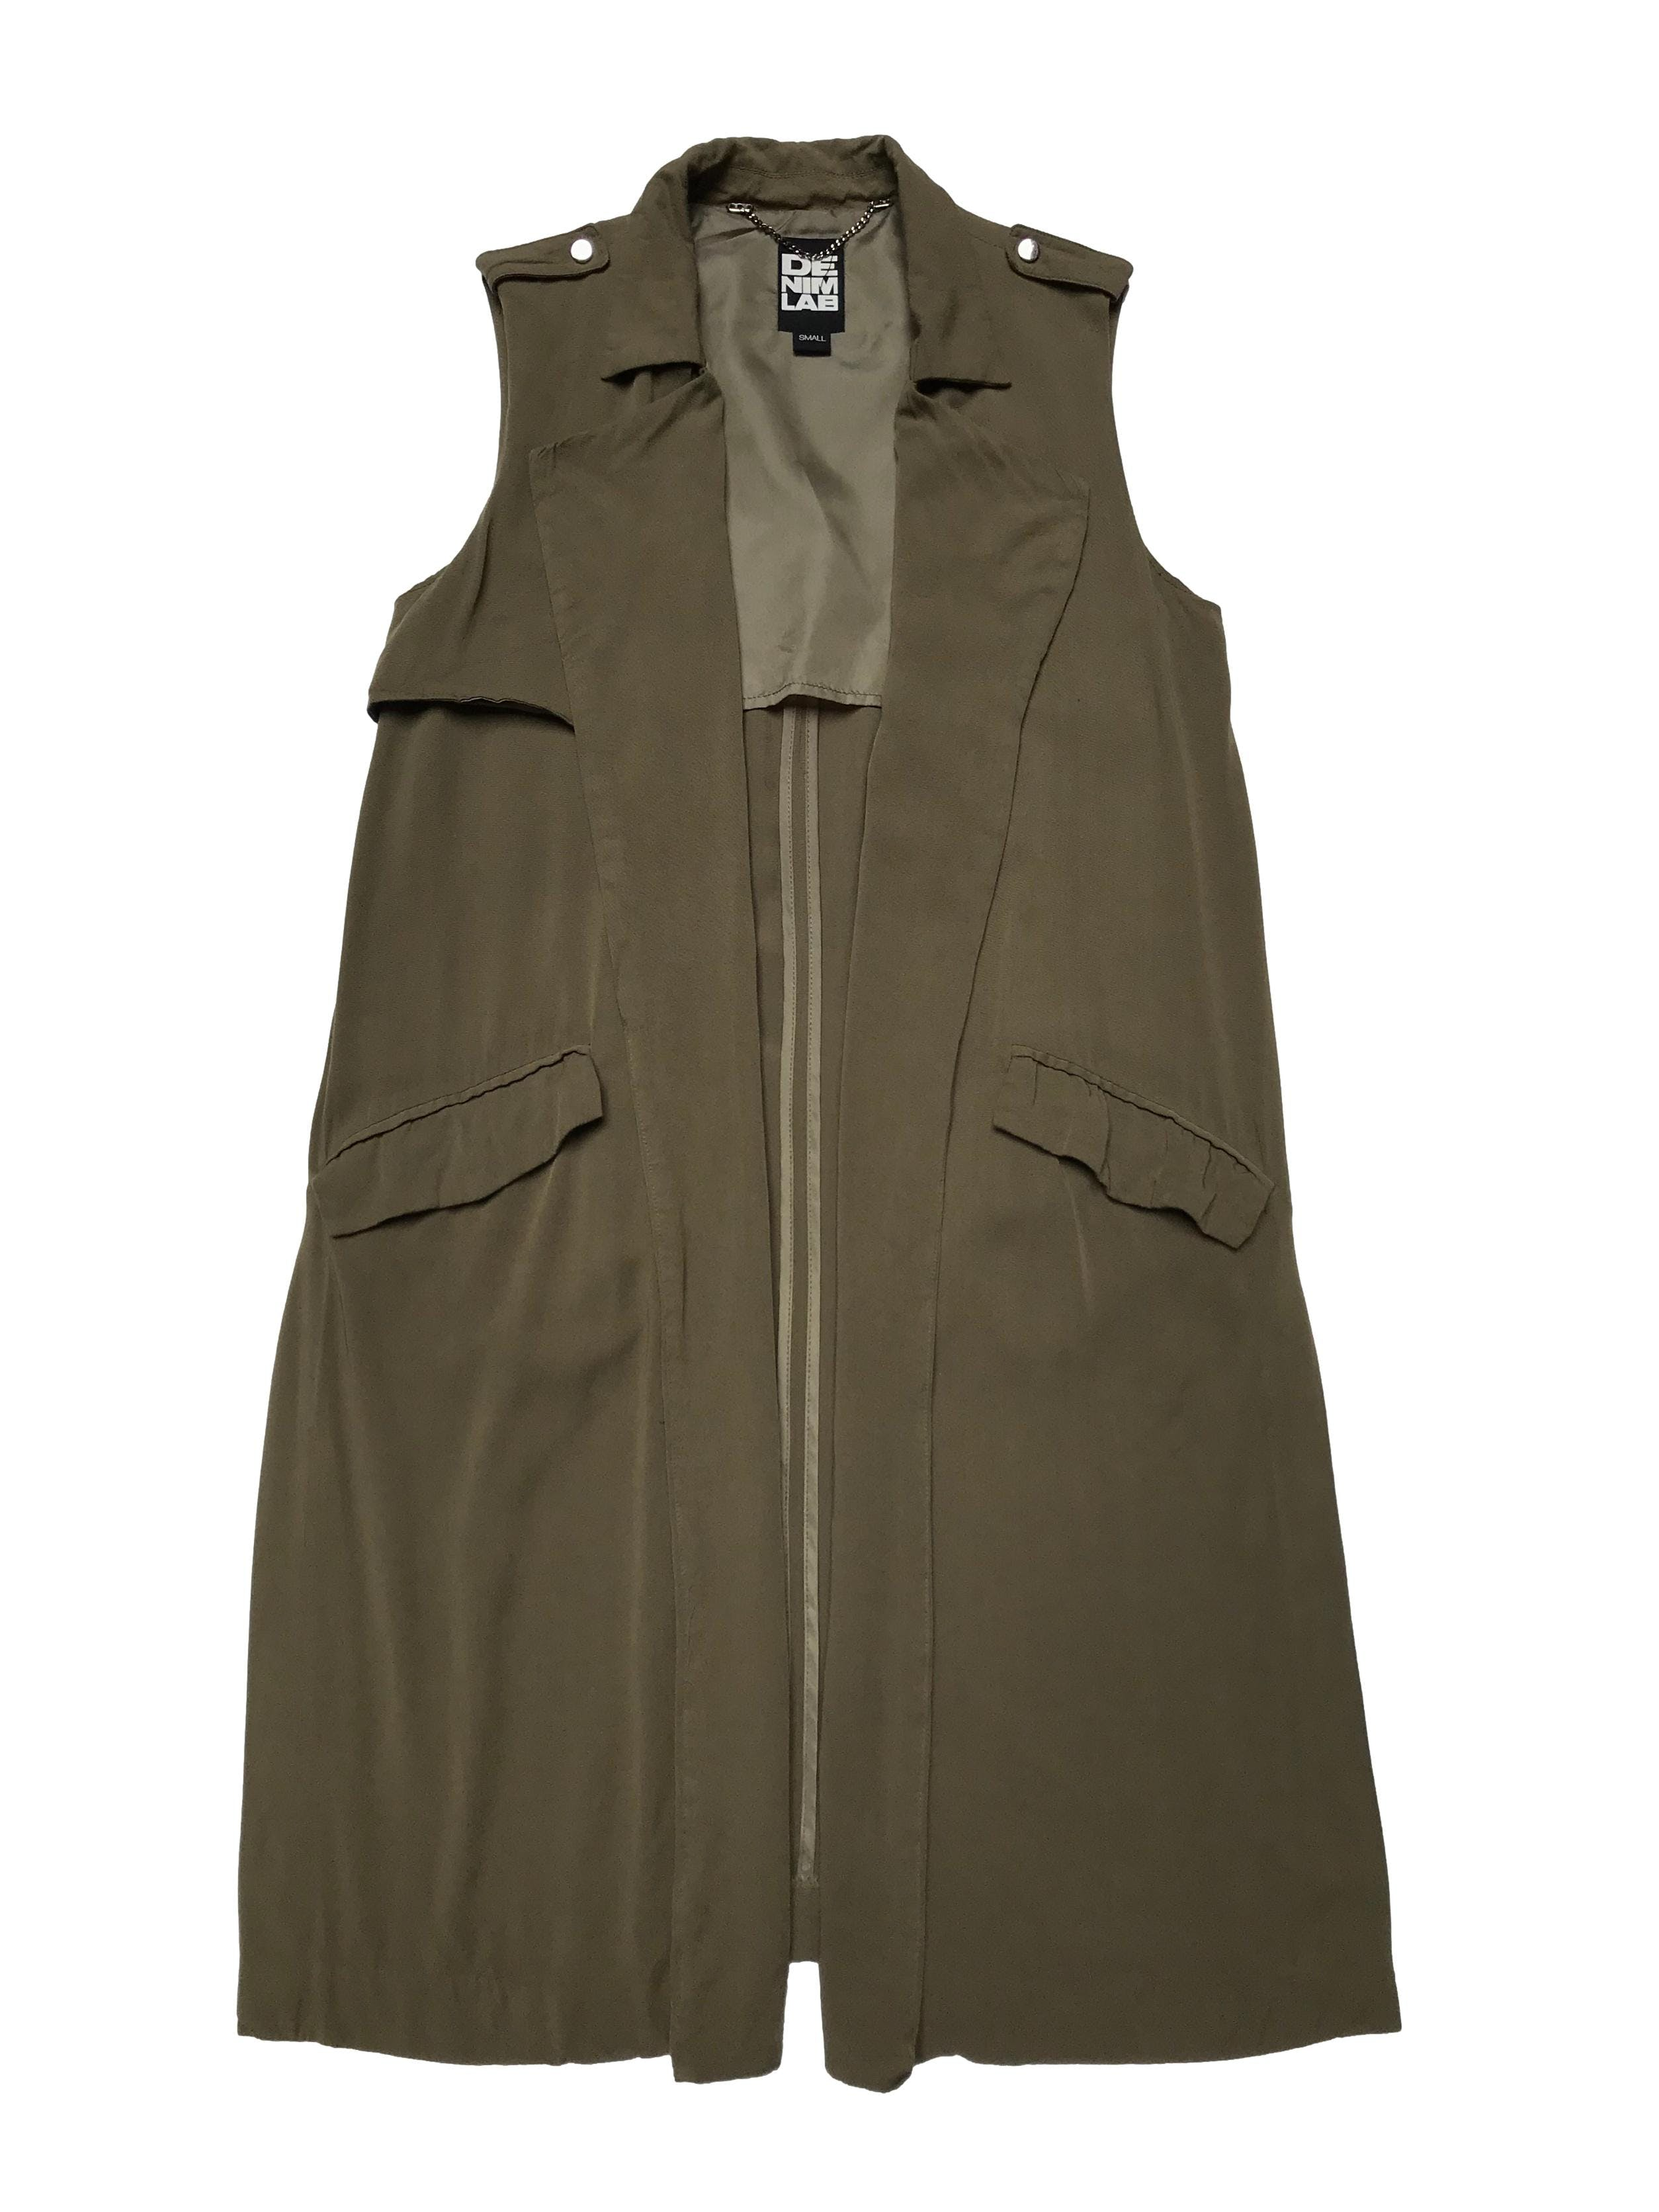 Chaleco largo verde olivo, 100% viscosa, bolsillos laterales, modelo abierto con aberturas en la basta. Largo 95cm